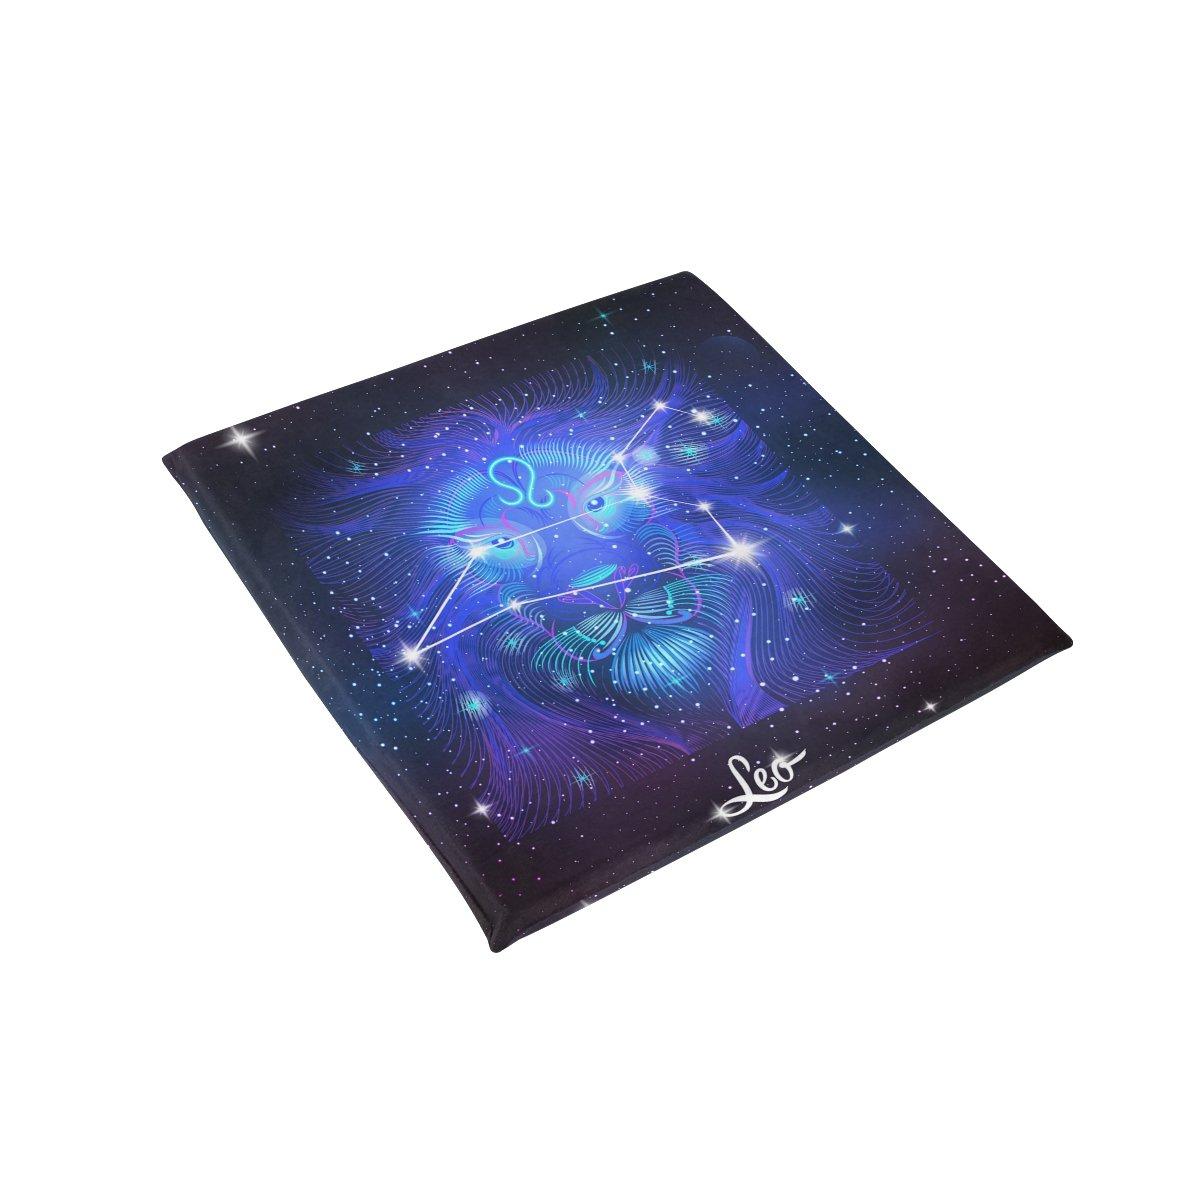 Constellation Zodiac Sign Leo Memory Foam Chair Pads Car Seat Cushion,16 x 16 inches